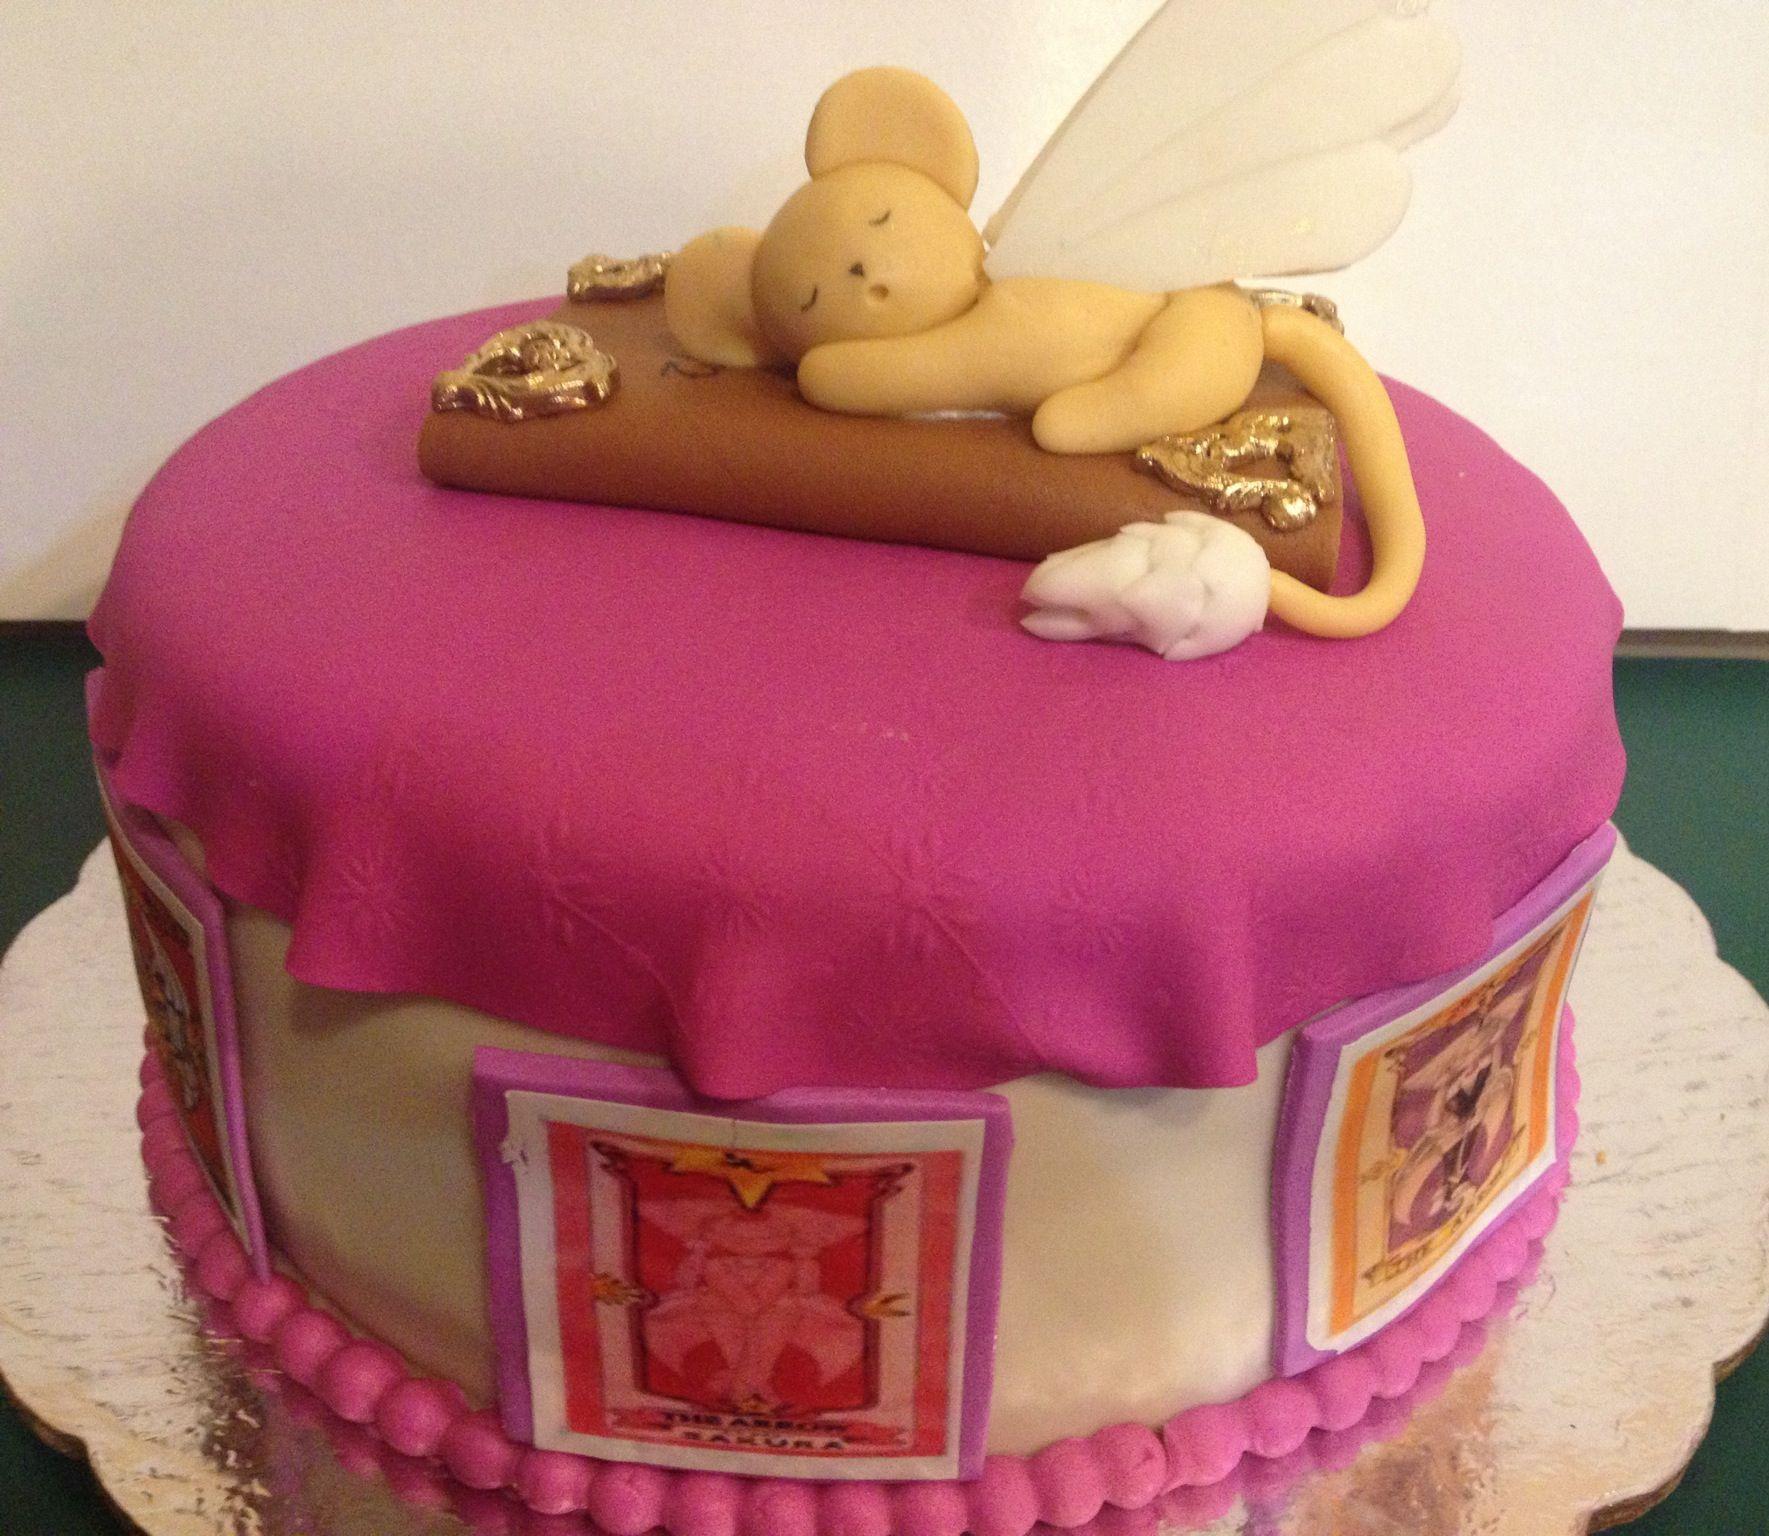 Sakura Card capture cake!!